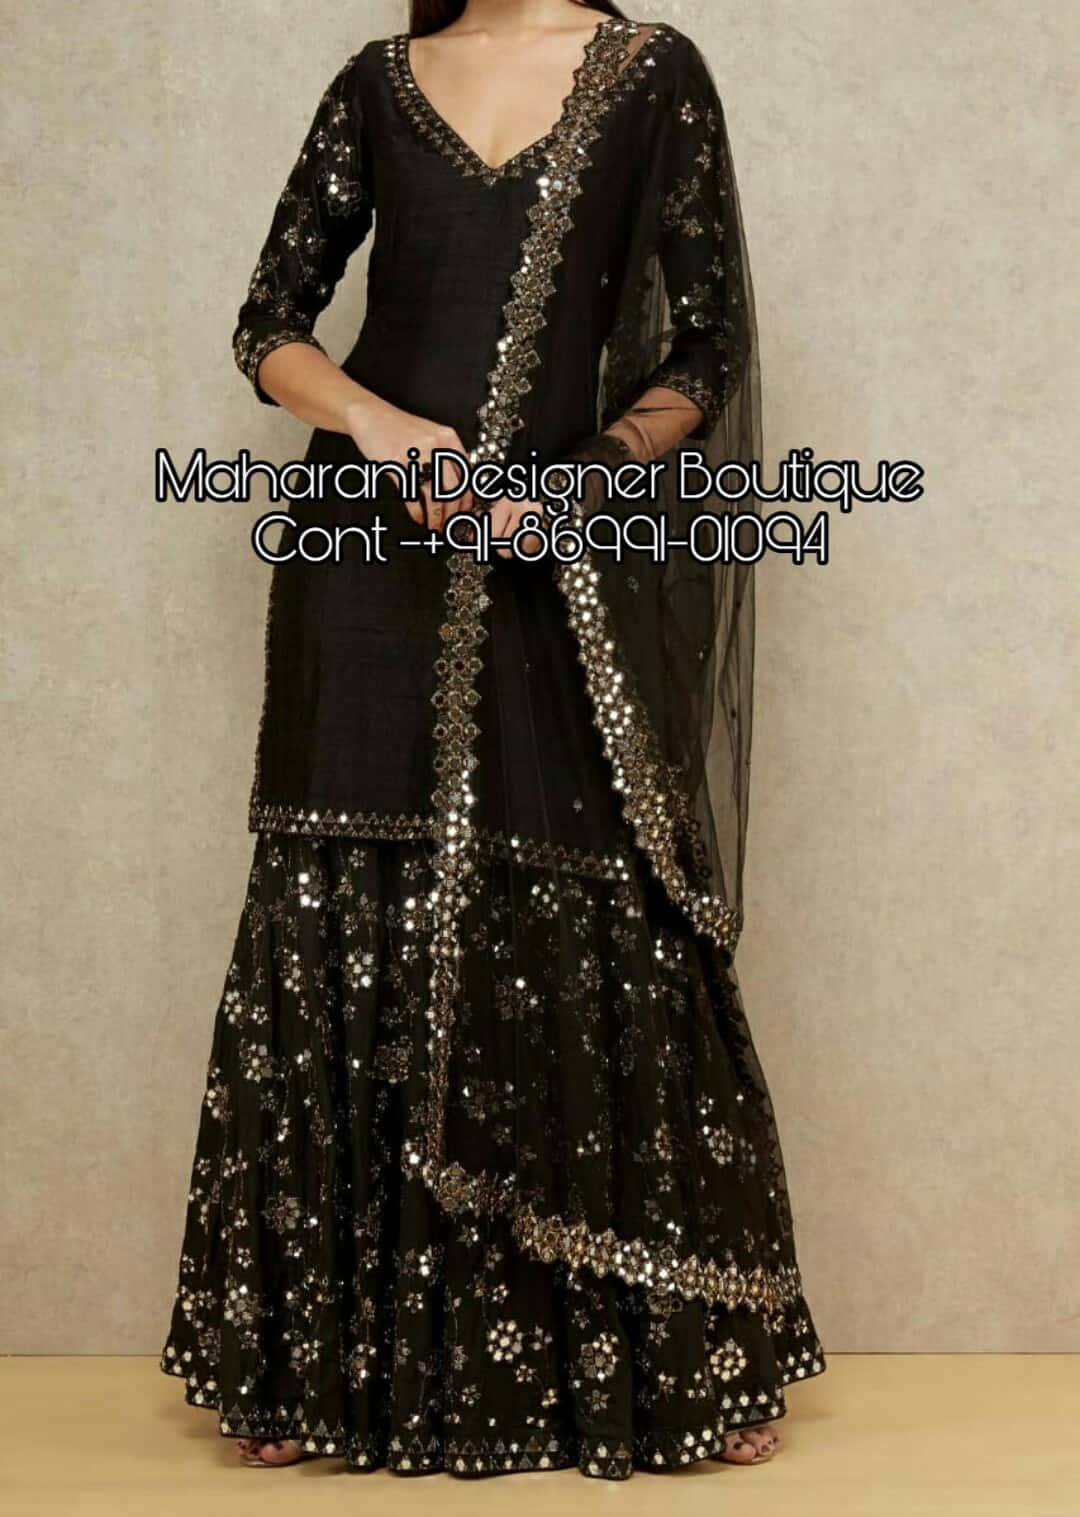 8d29e65a83 Lehenga Choli Boutique Online, lehenga choli online shopping, lehenga choli  designs, online boutique